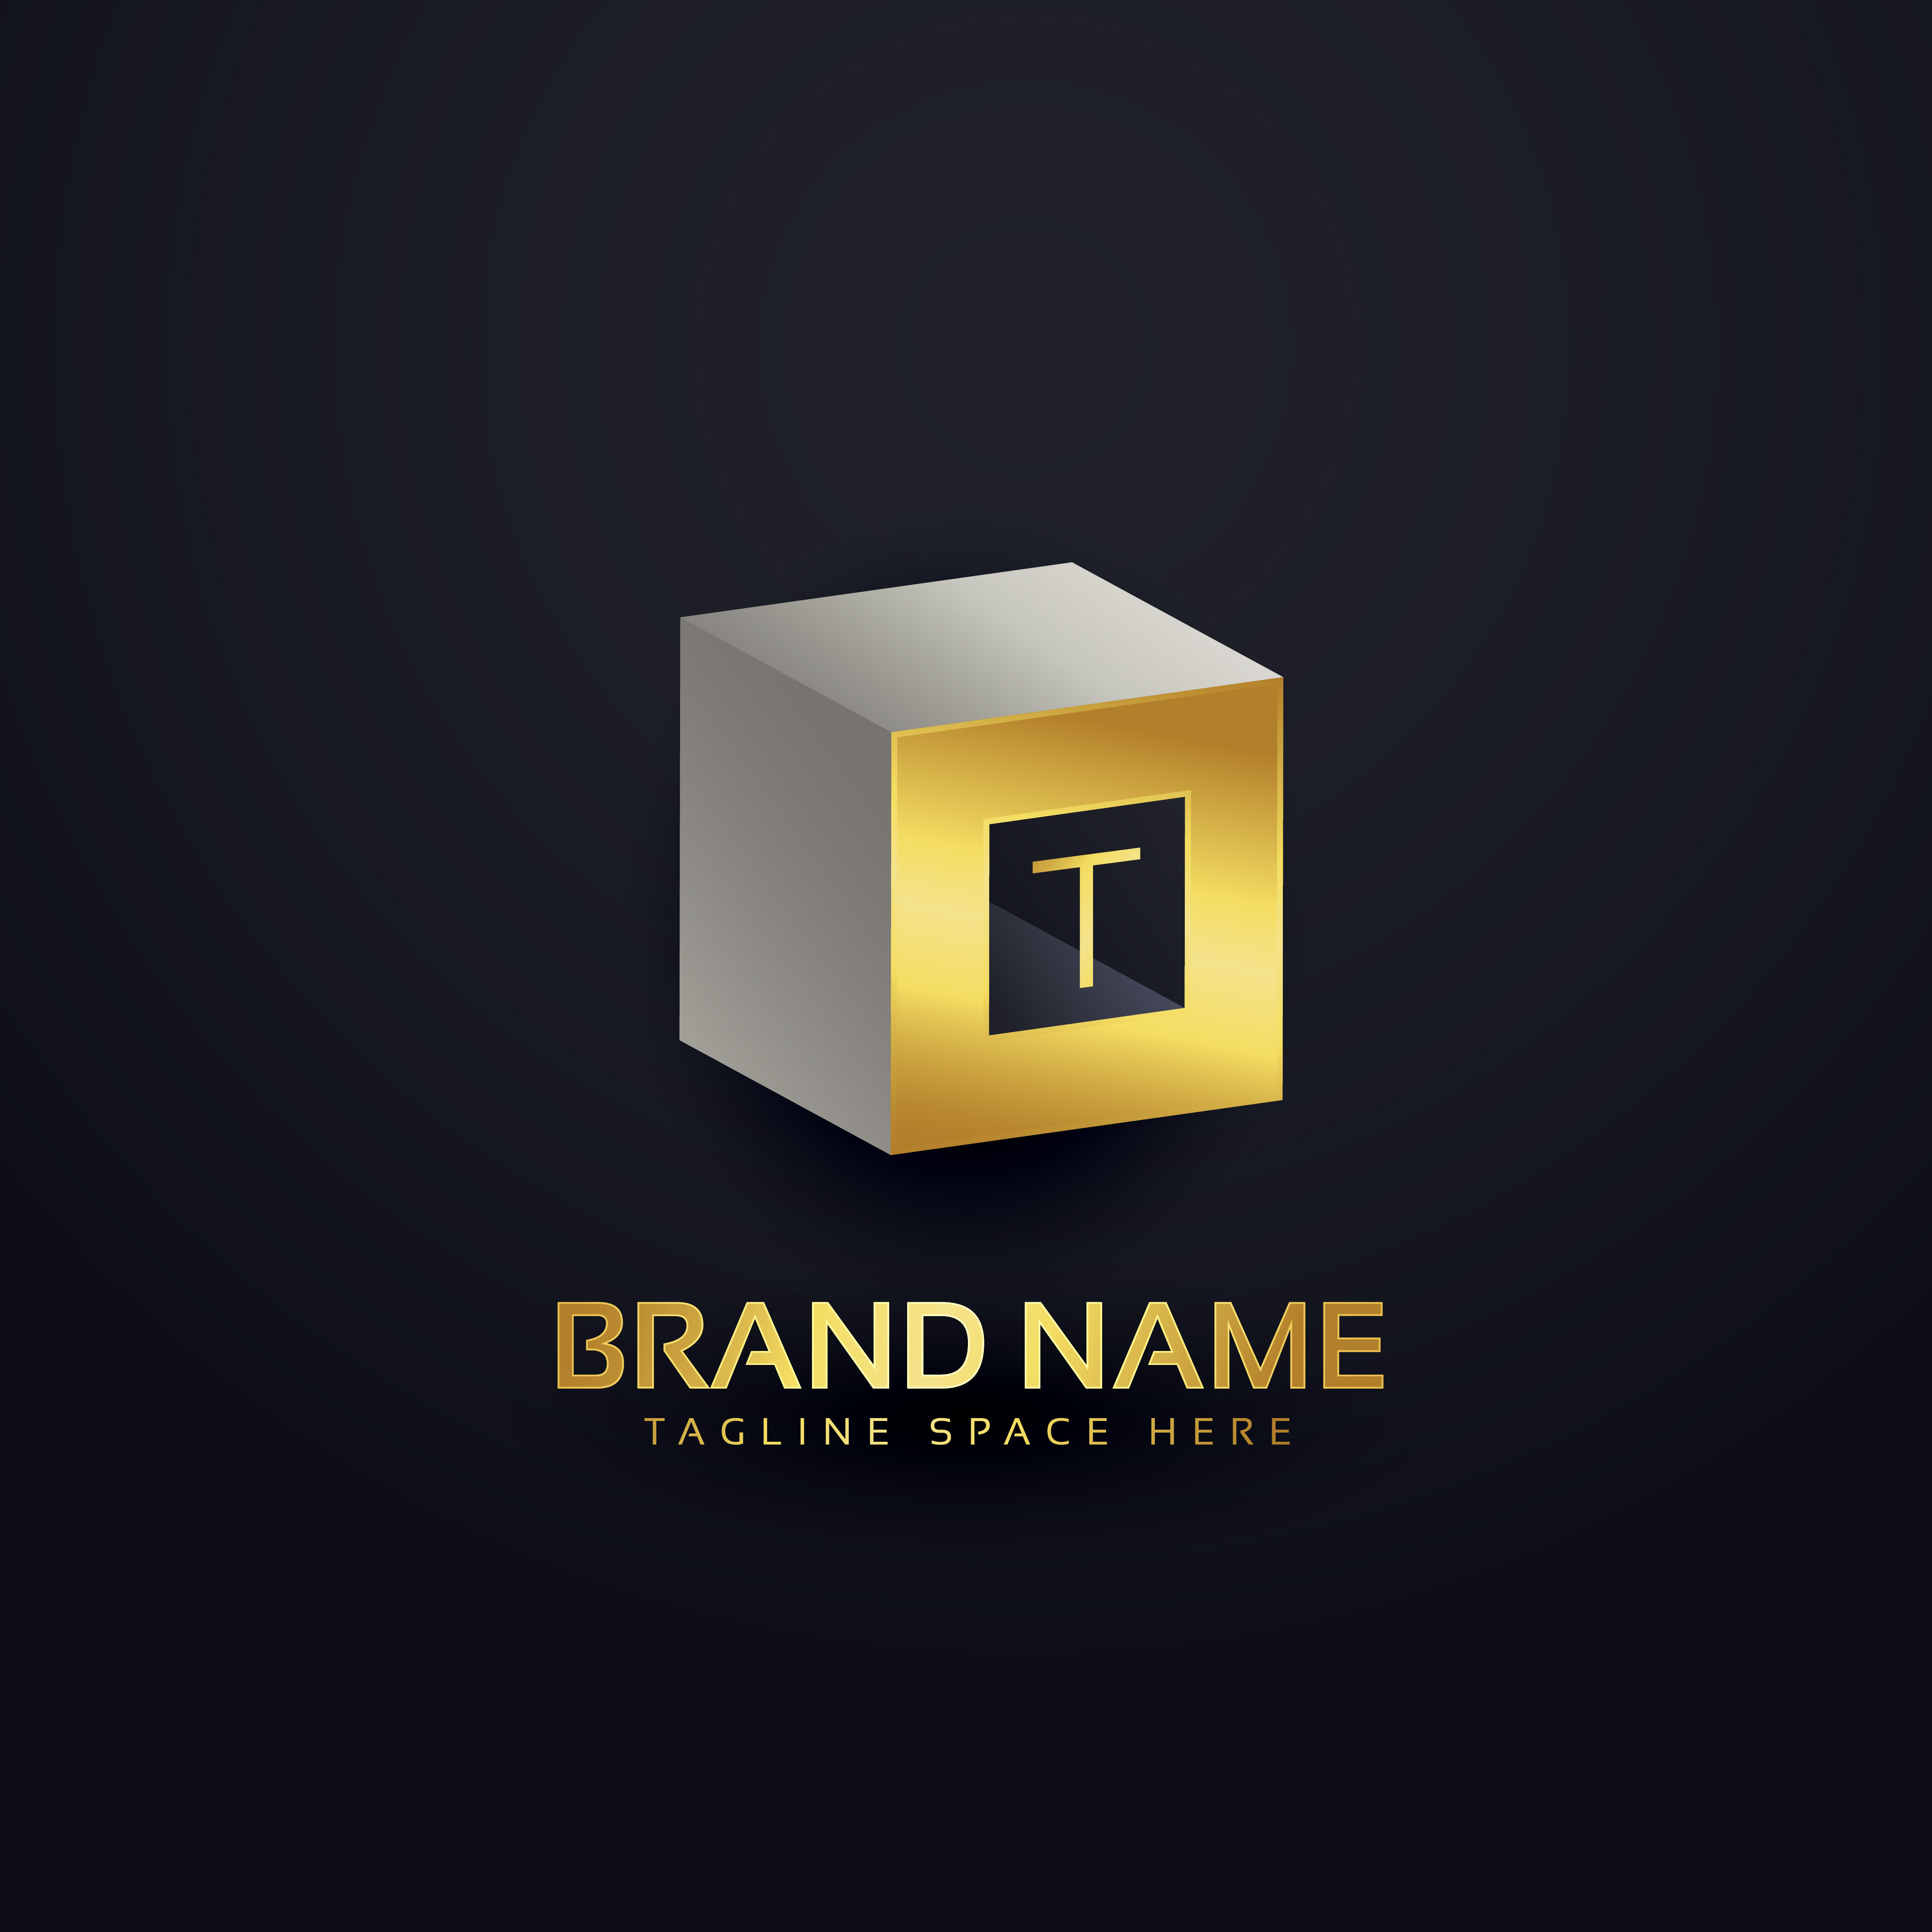 3d Letter T Logo Design Template